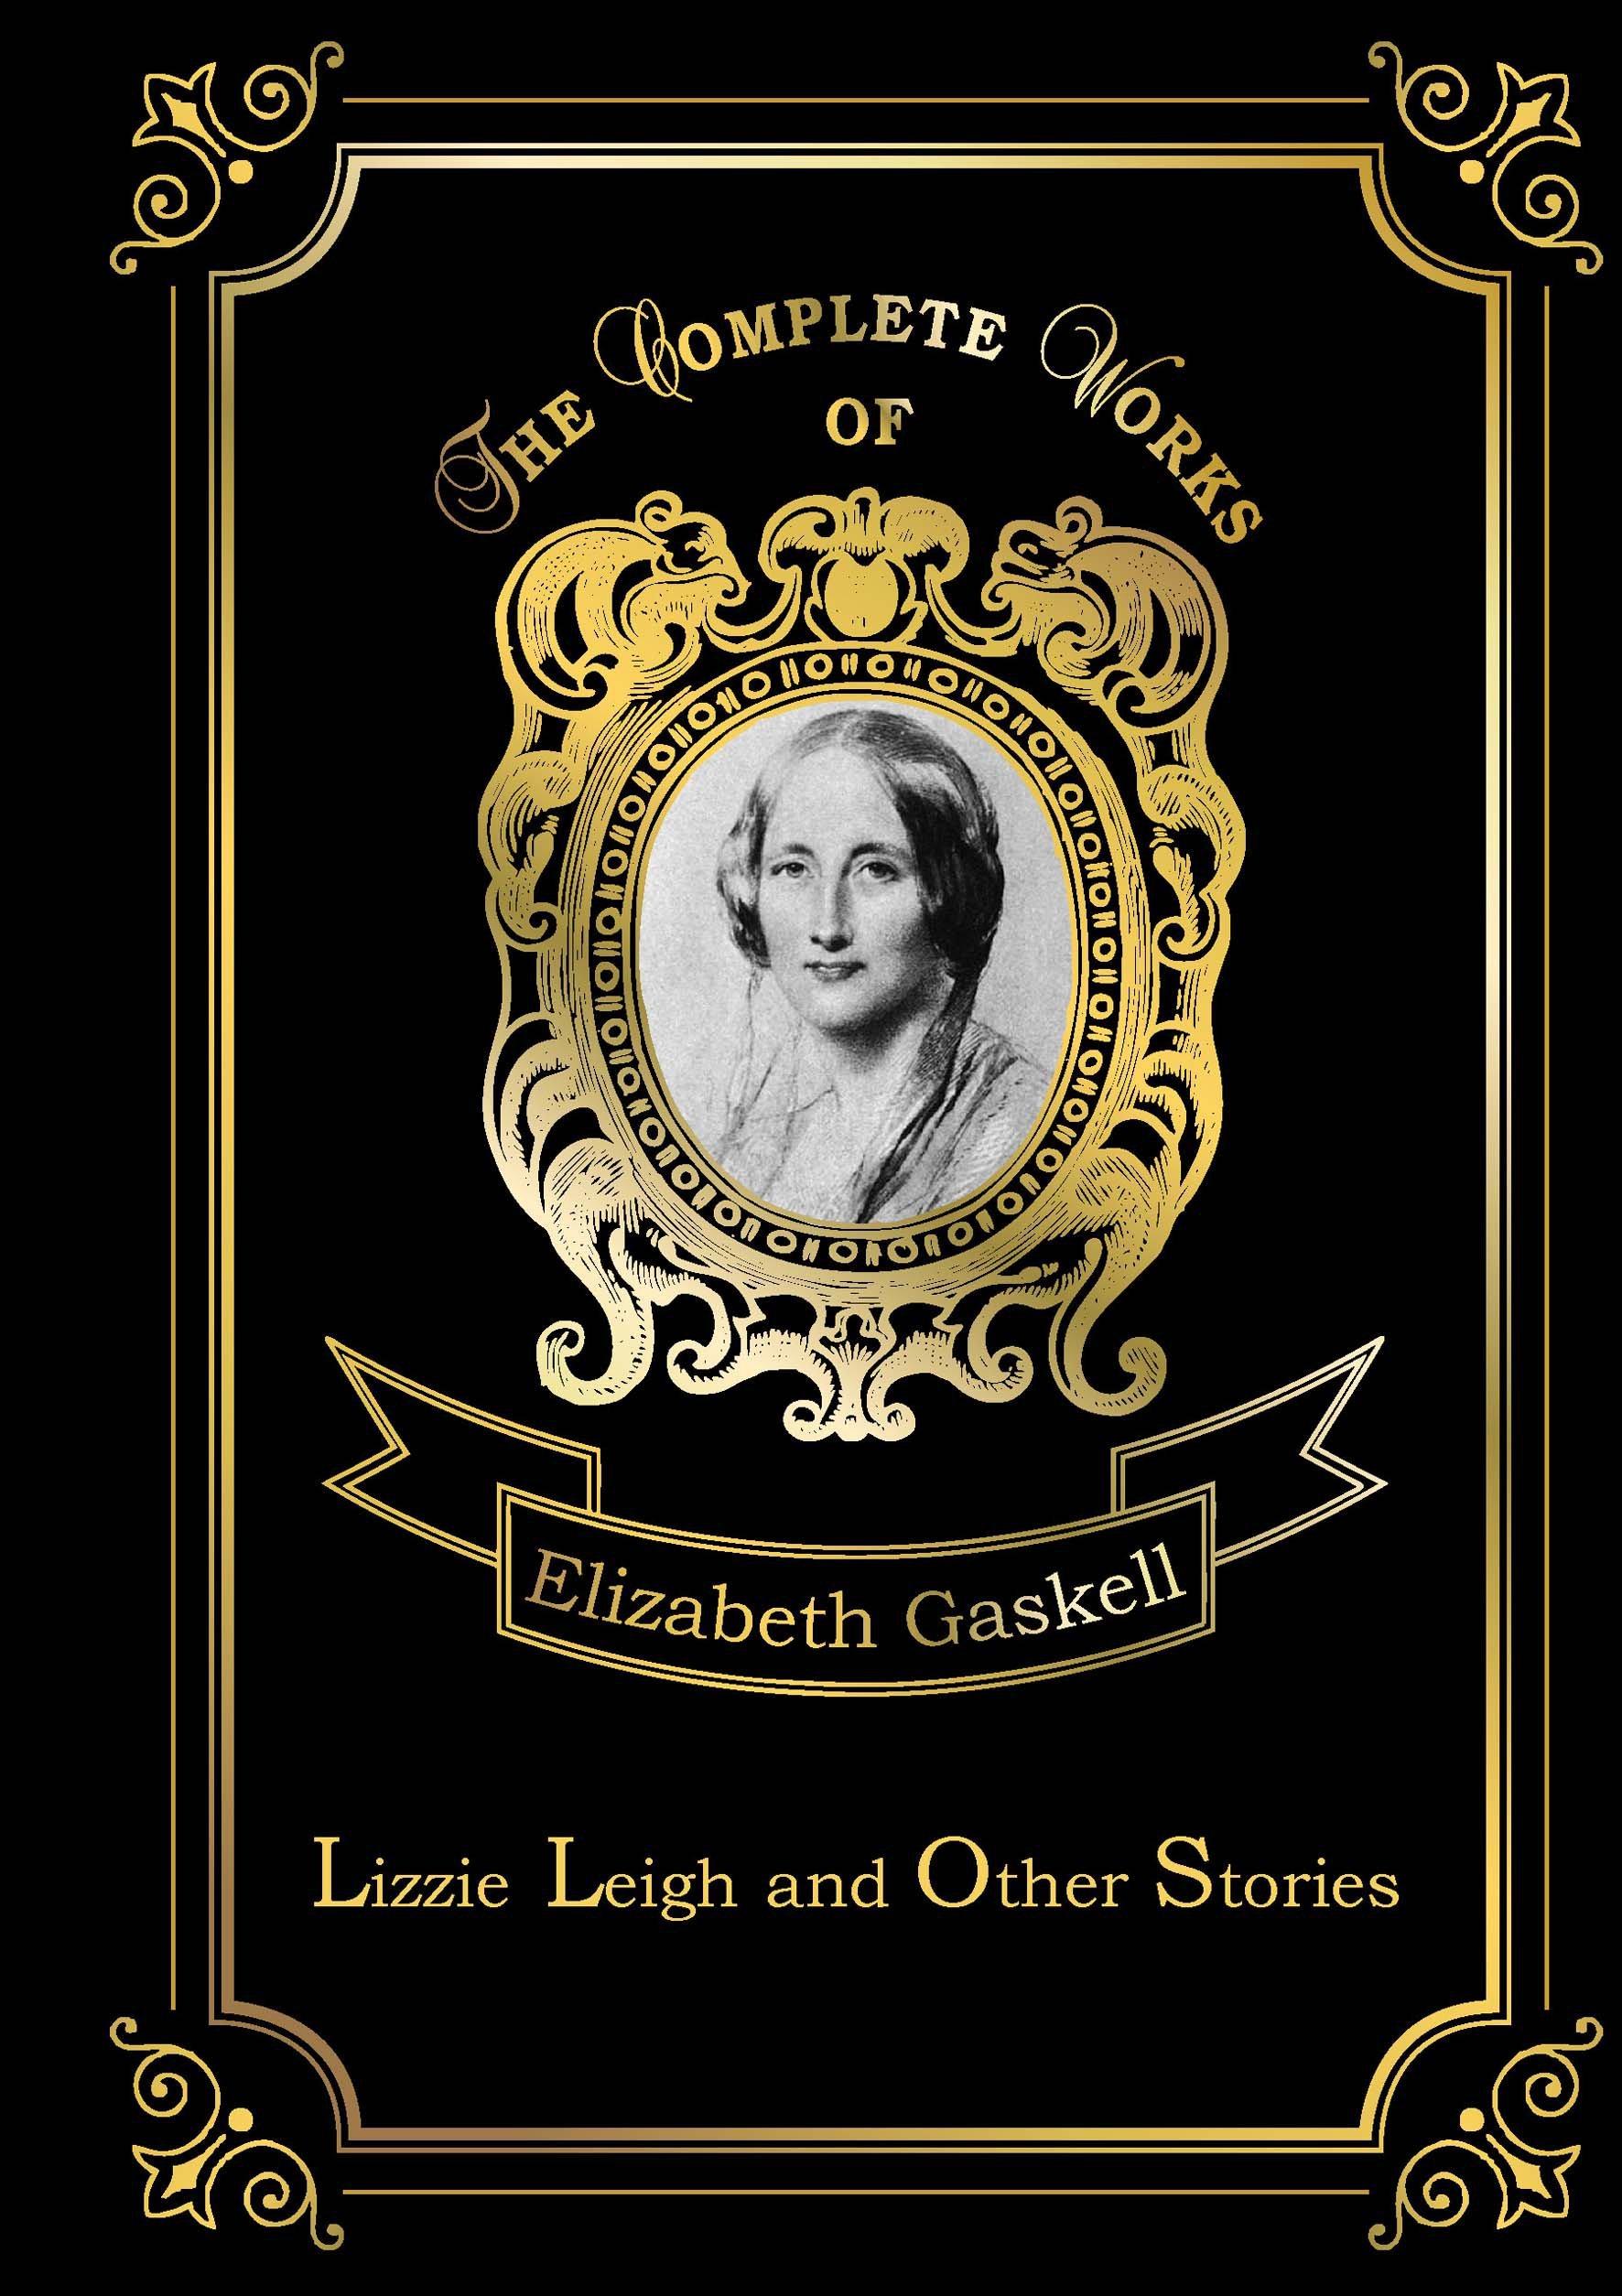 Гаскелл Элизабет Lizzie Leigh and Other Stories = Лиззи Ли и другие истории: на англ.яз гаскелл элизабет short stories the old nurse's story and other tales сборник рассказы старой медсестры и другие истории на англ яз